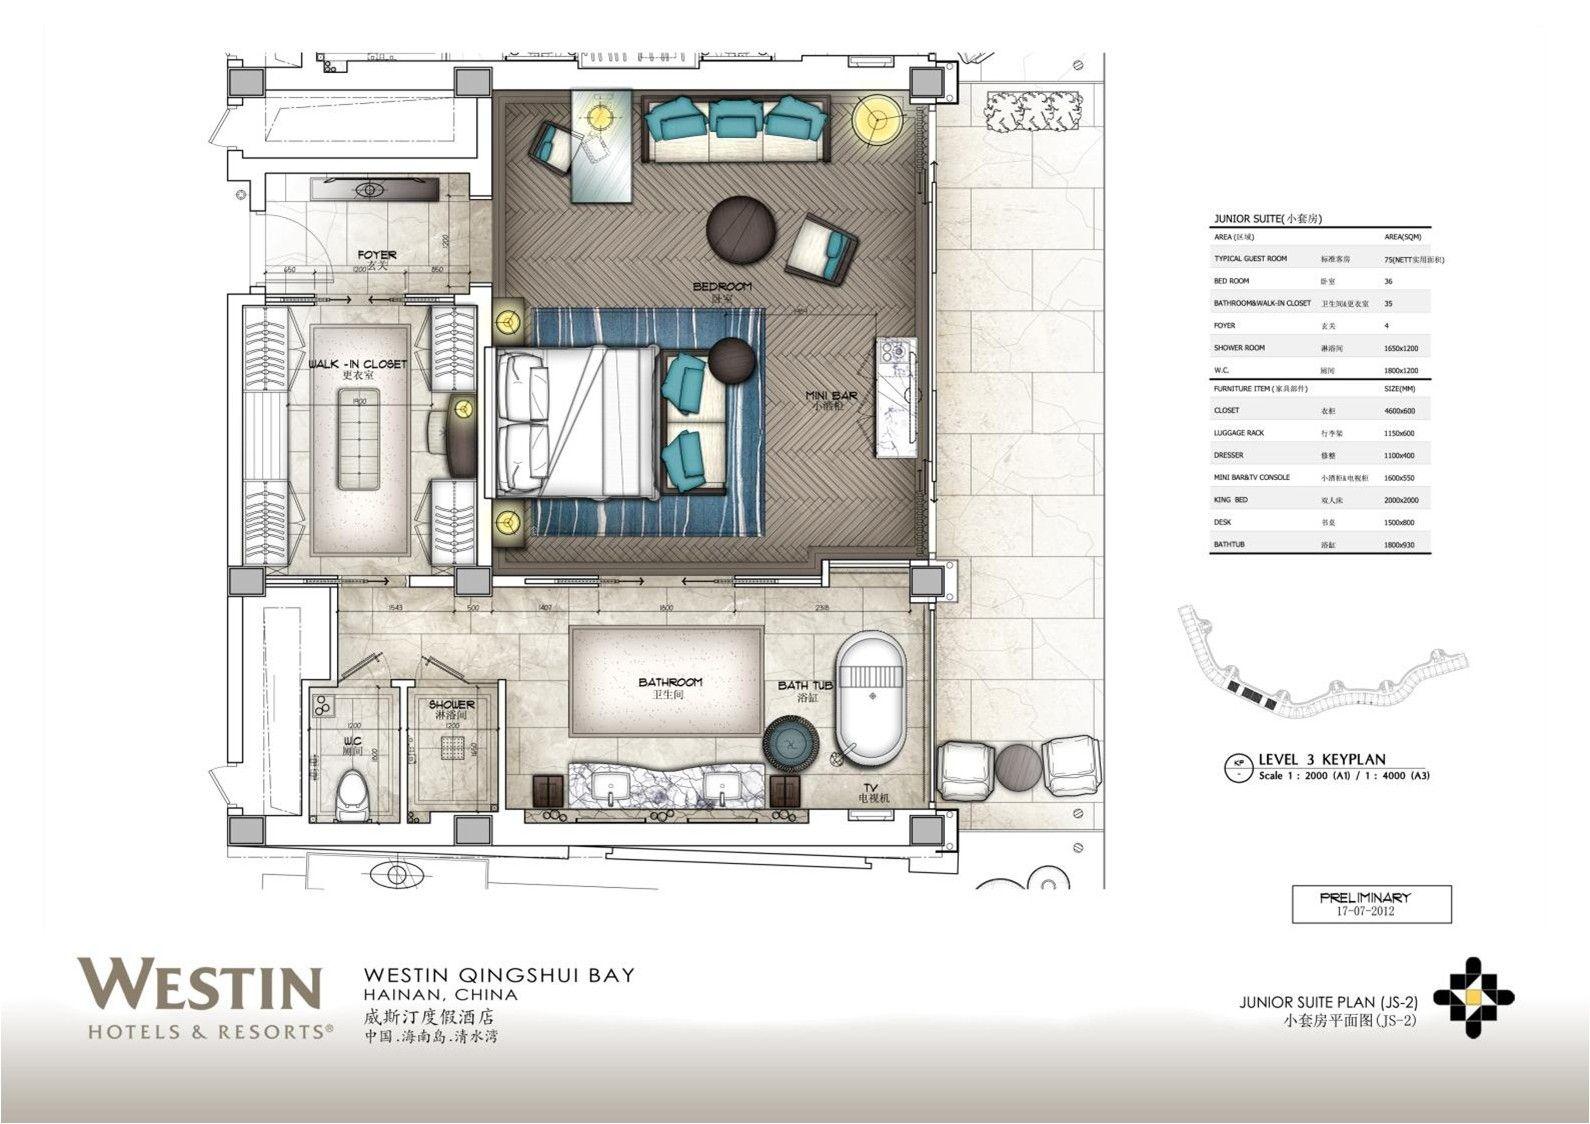 32b069c829a948a02260718d0e485dbc Jpg 1590 1124 Hotel Floor Plan Hotel Room Plan Hotel Floor